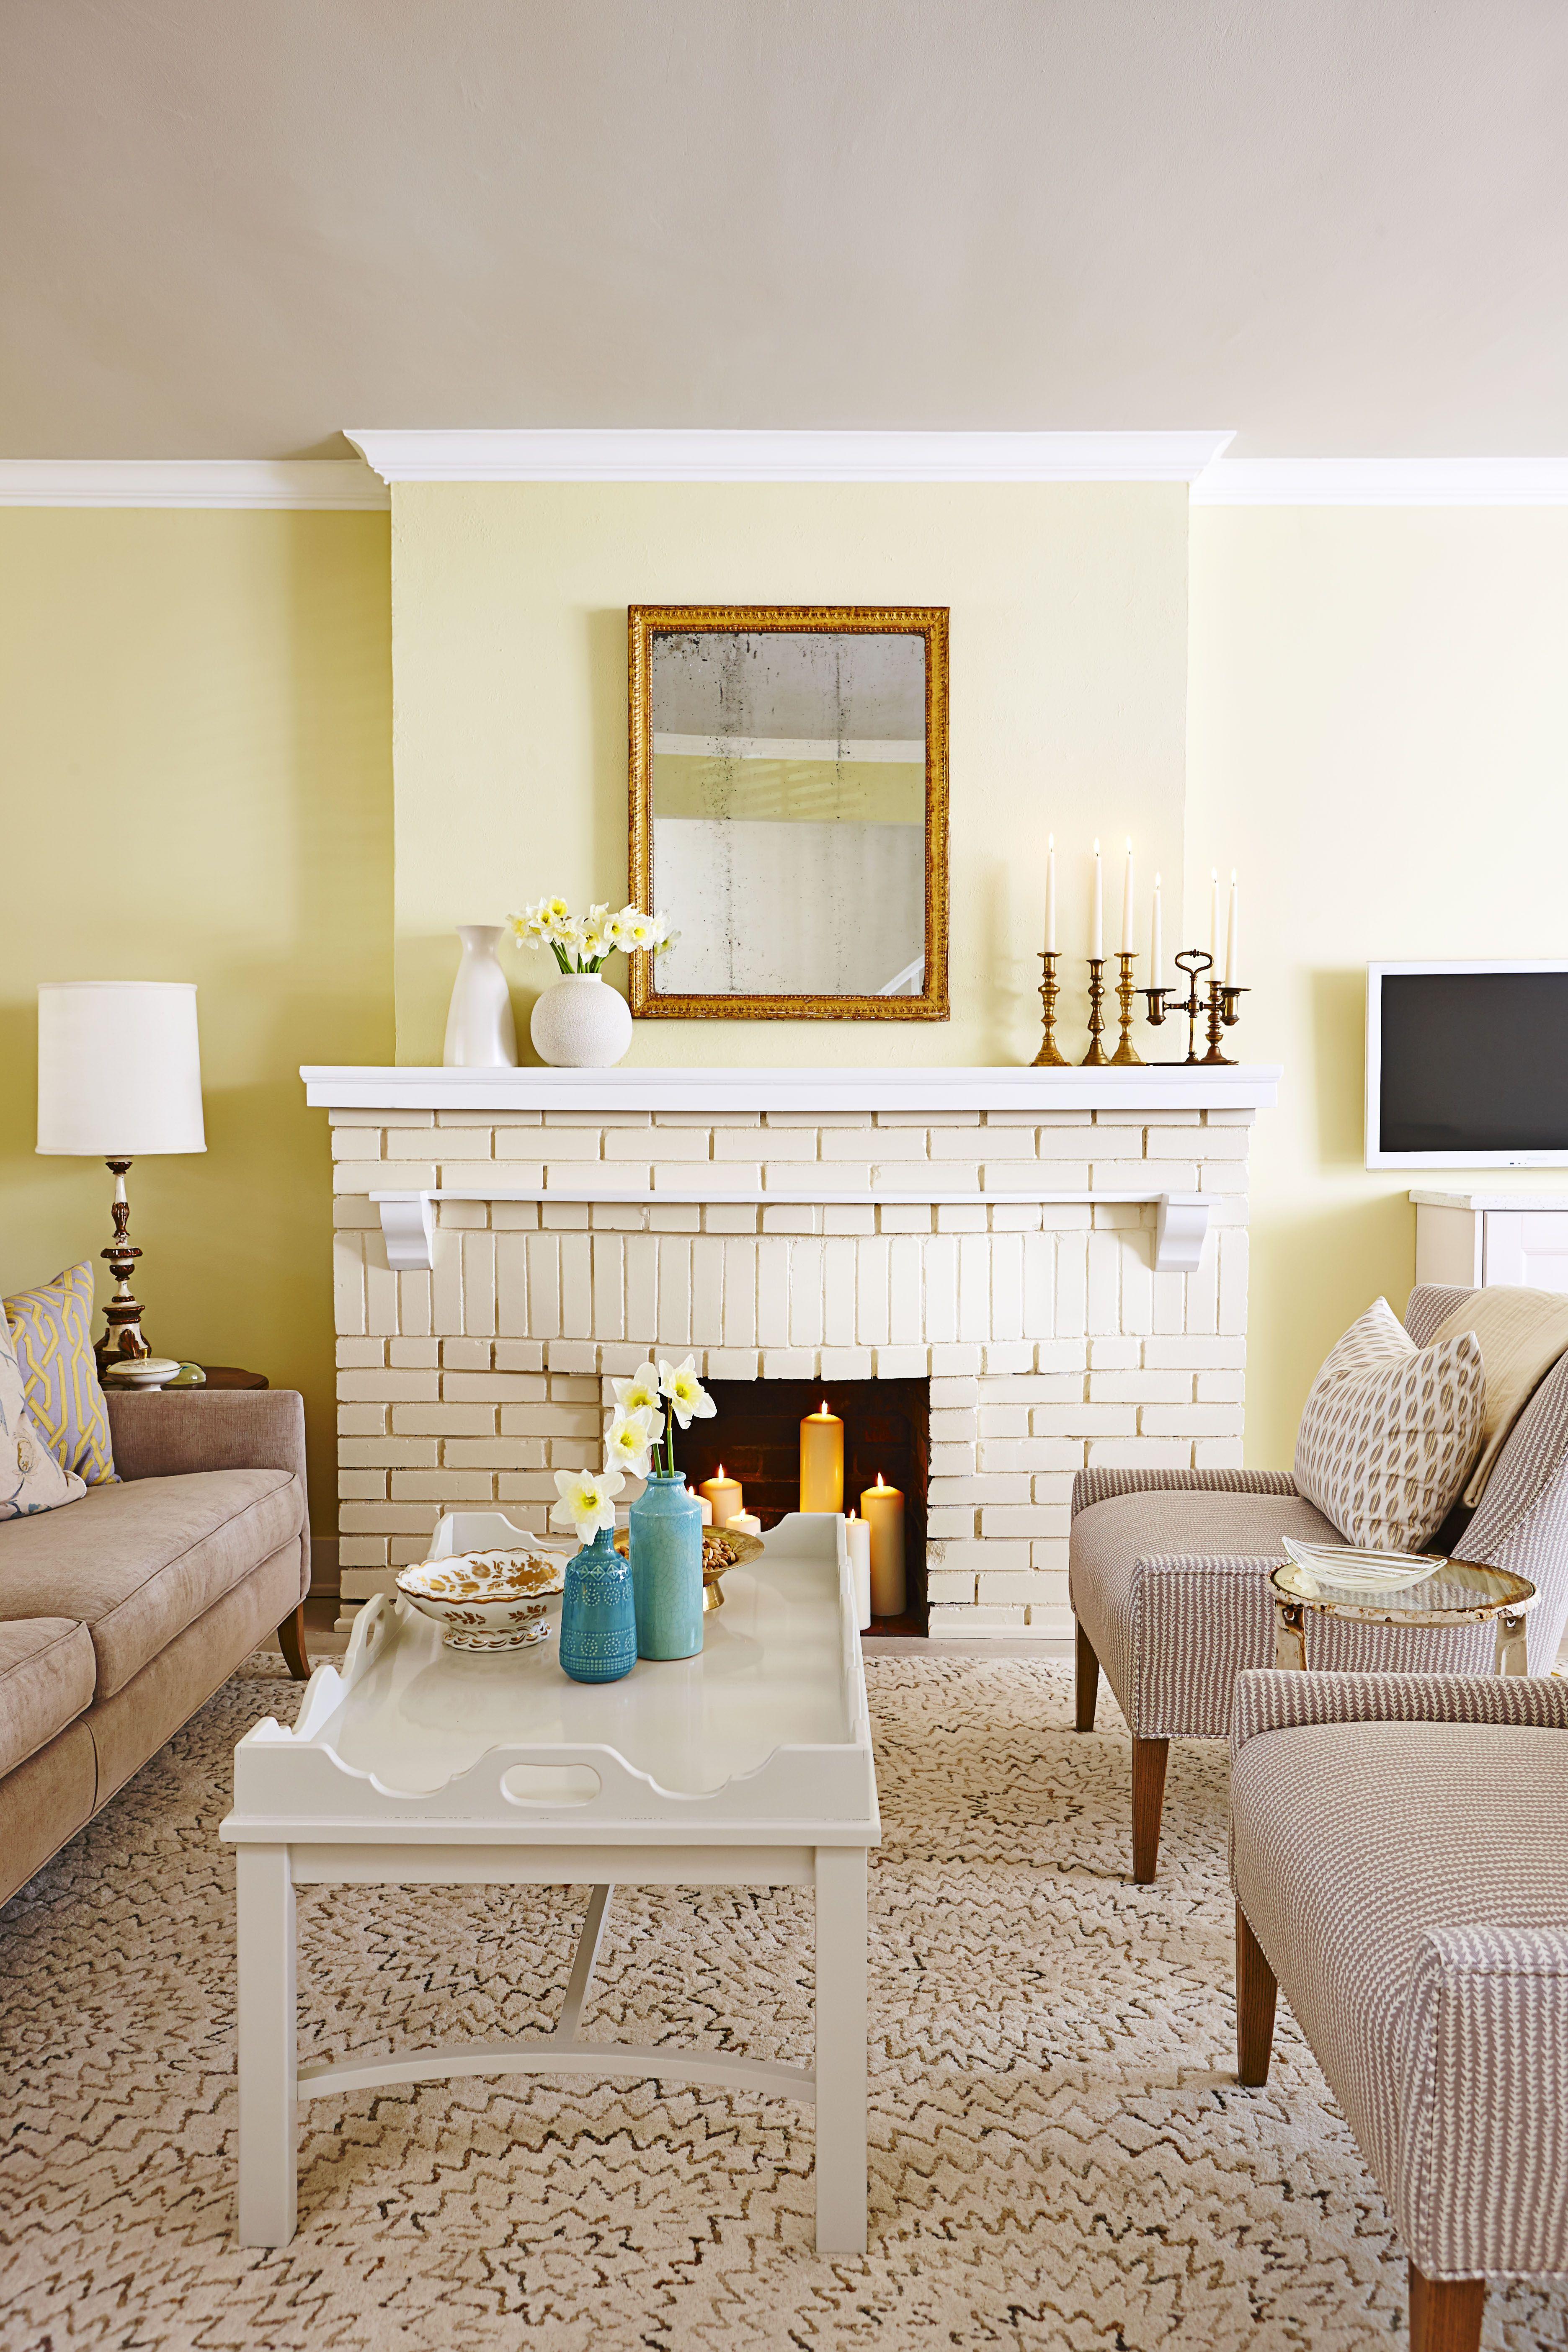 18 fireplace decorating ideas best fireplace design inspiration rh goodhousekeeping com